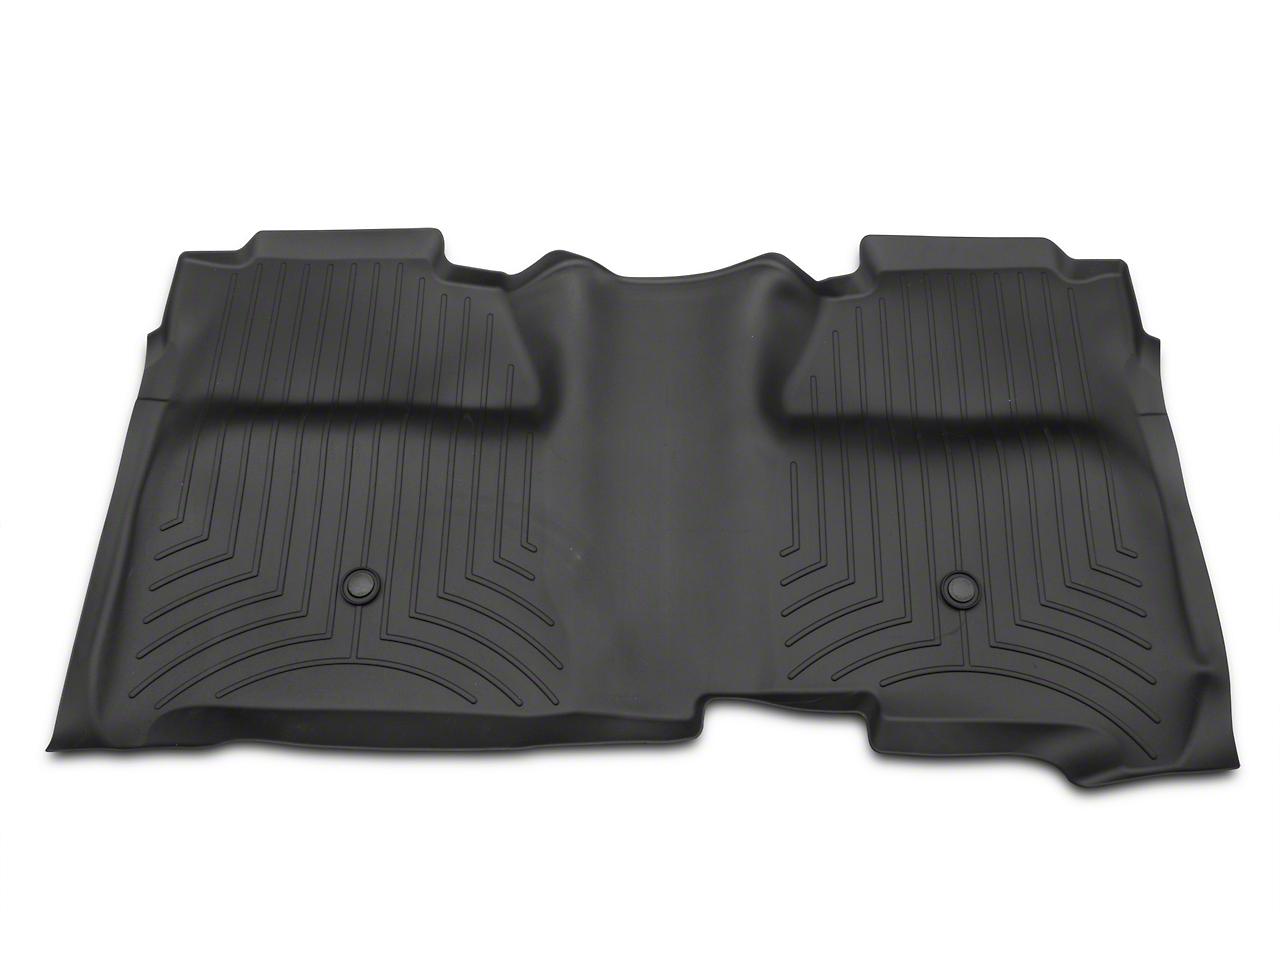 Weathertech DigitalFit Rear Floor Mat w/ Underseat Coverage - Black (14-18 Silverado 1500 Crew Cab)